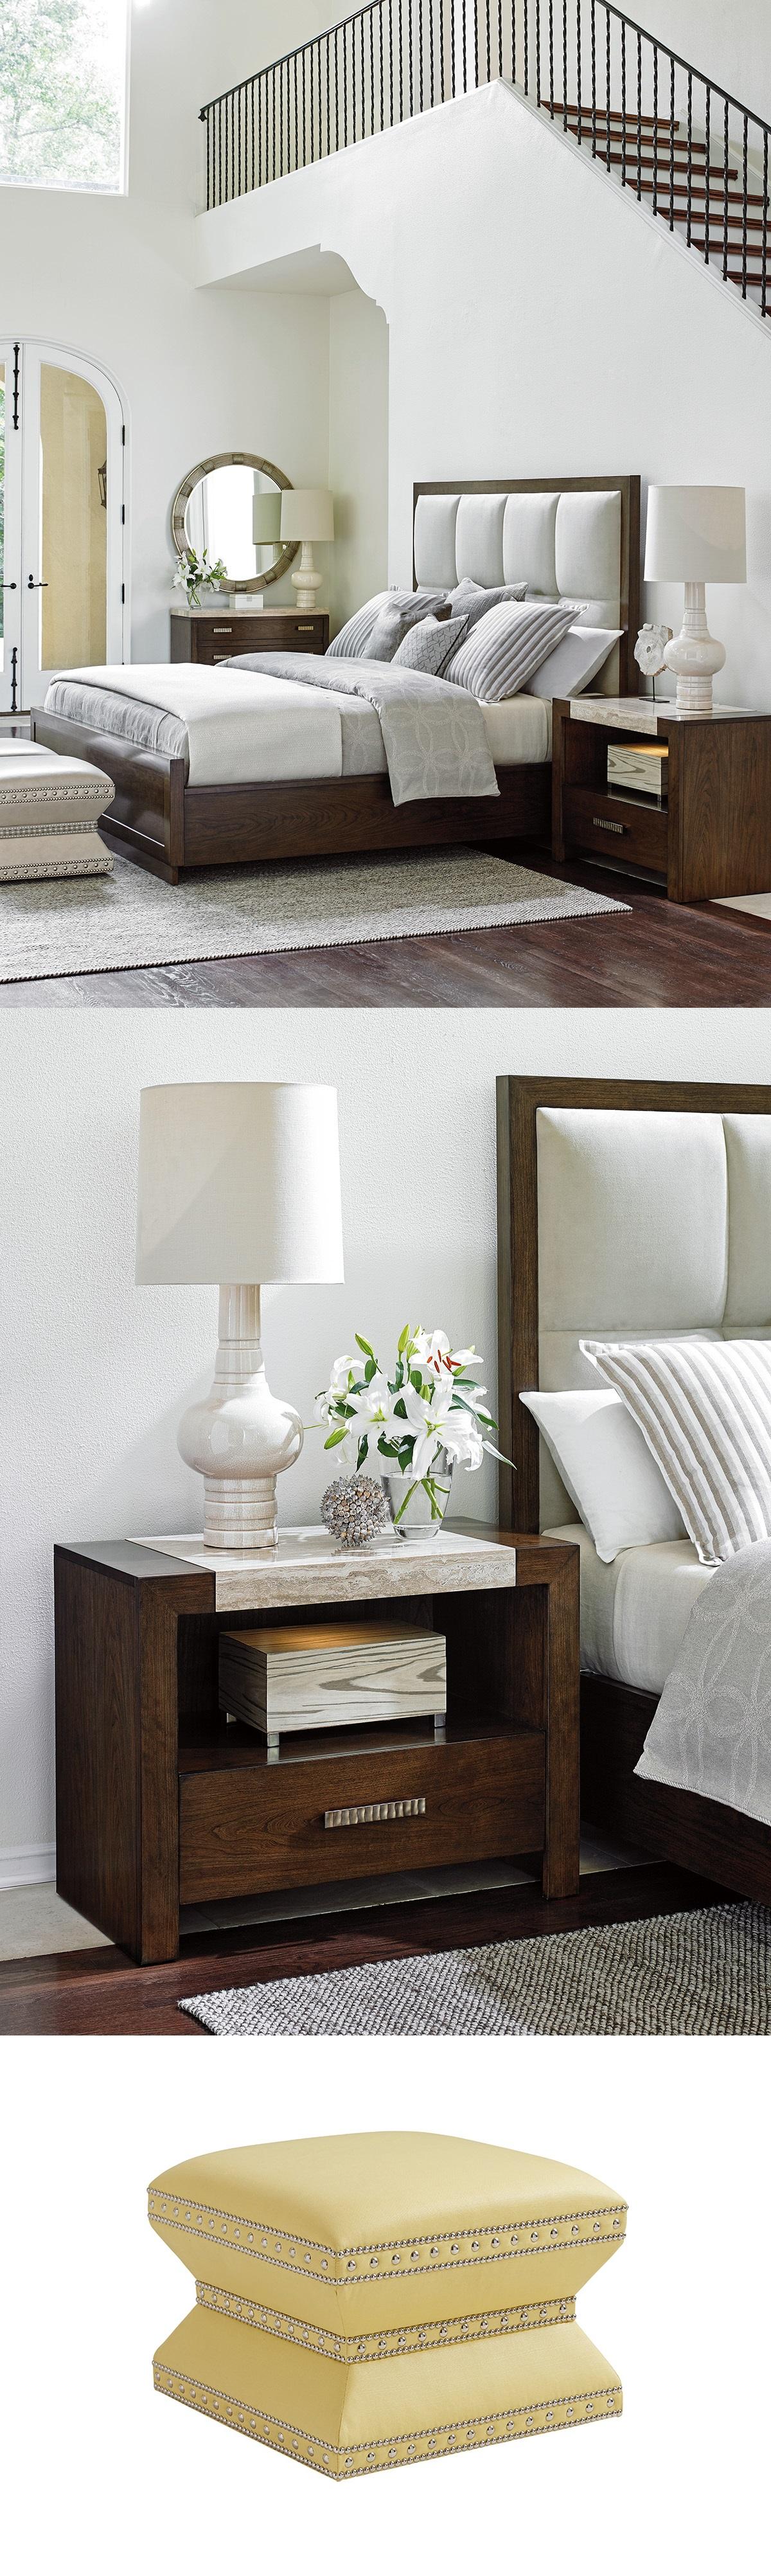 Hotel Furniture Furniture Furniture Design Hotel